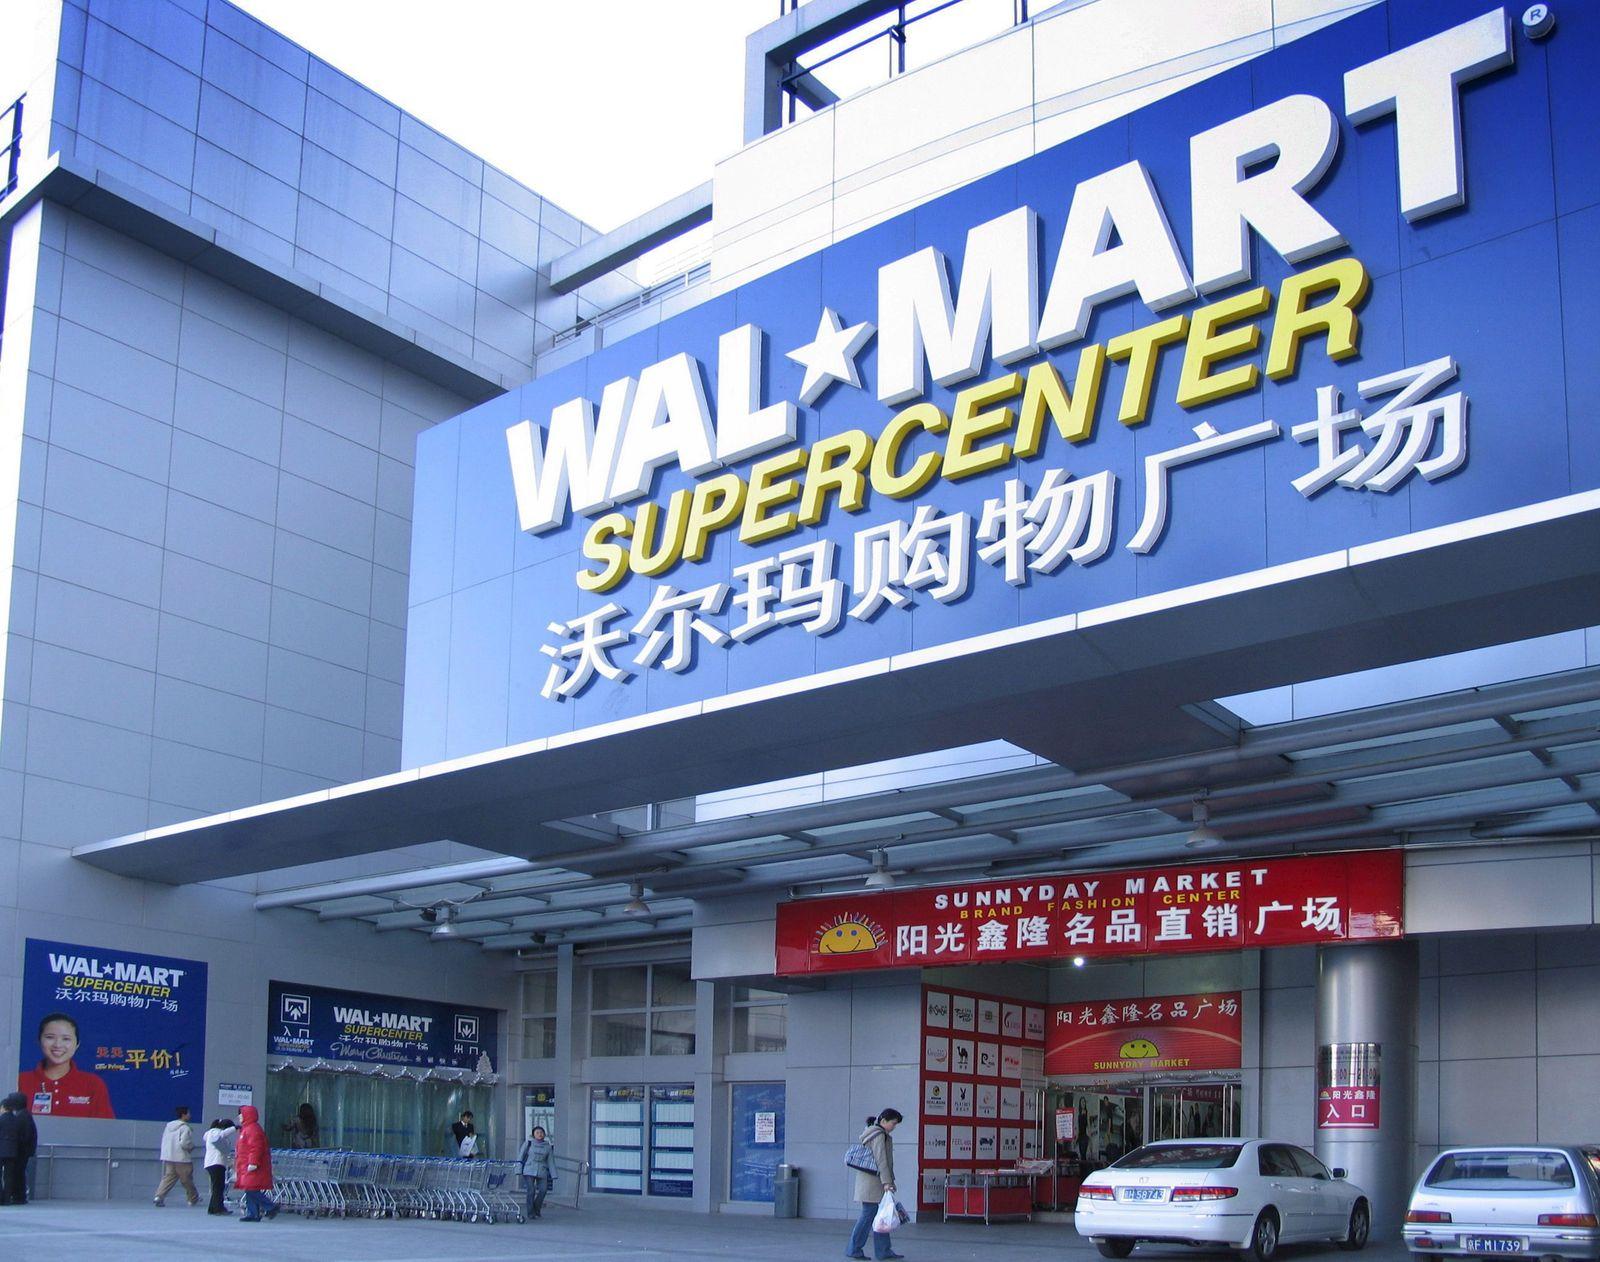 Walmart in China / Peking